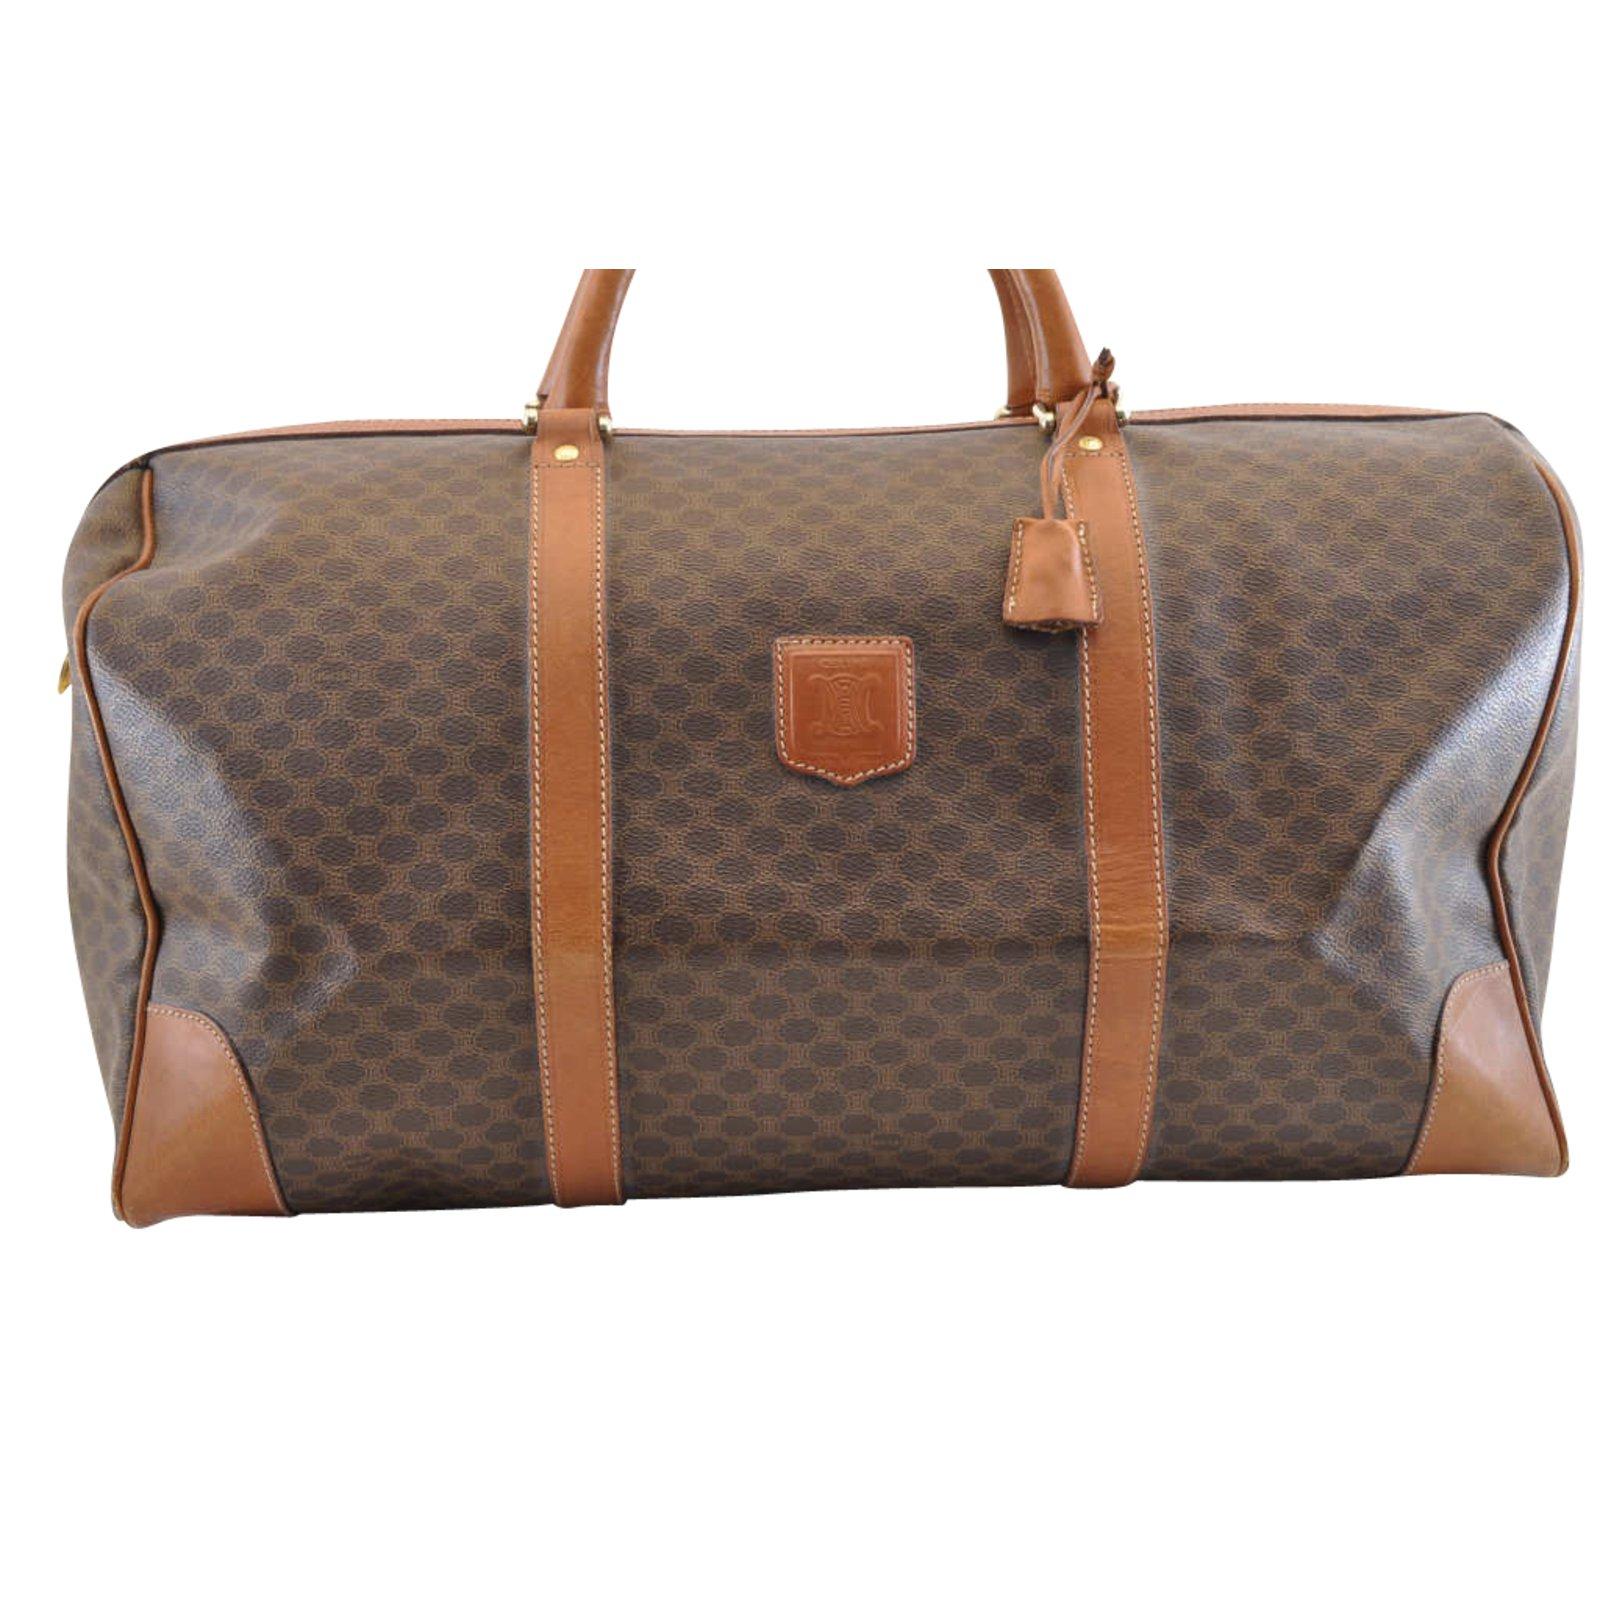 65f77d492416 Céline boston bag handbags other brown ref joli closet jpg 1600x1600  Leather handbags celine boston bag